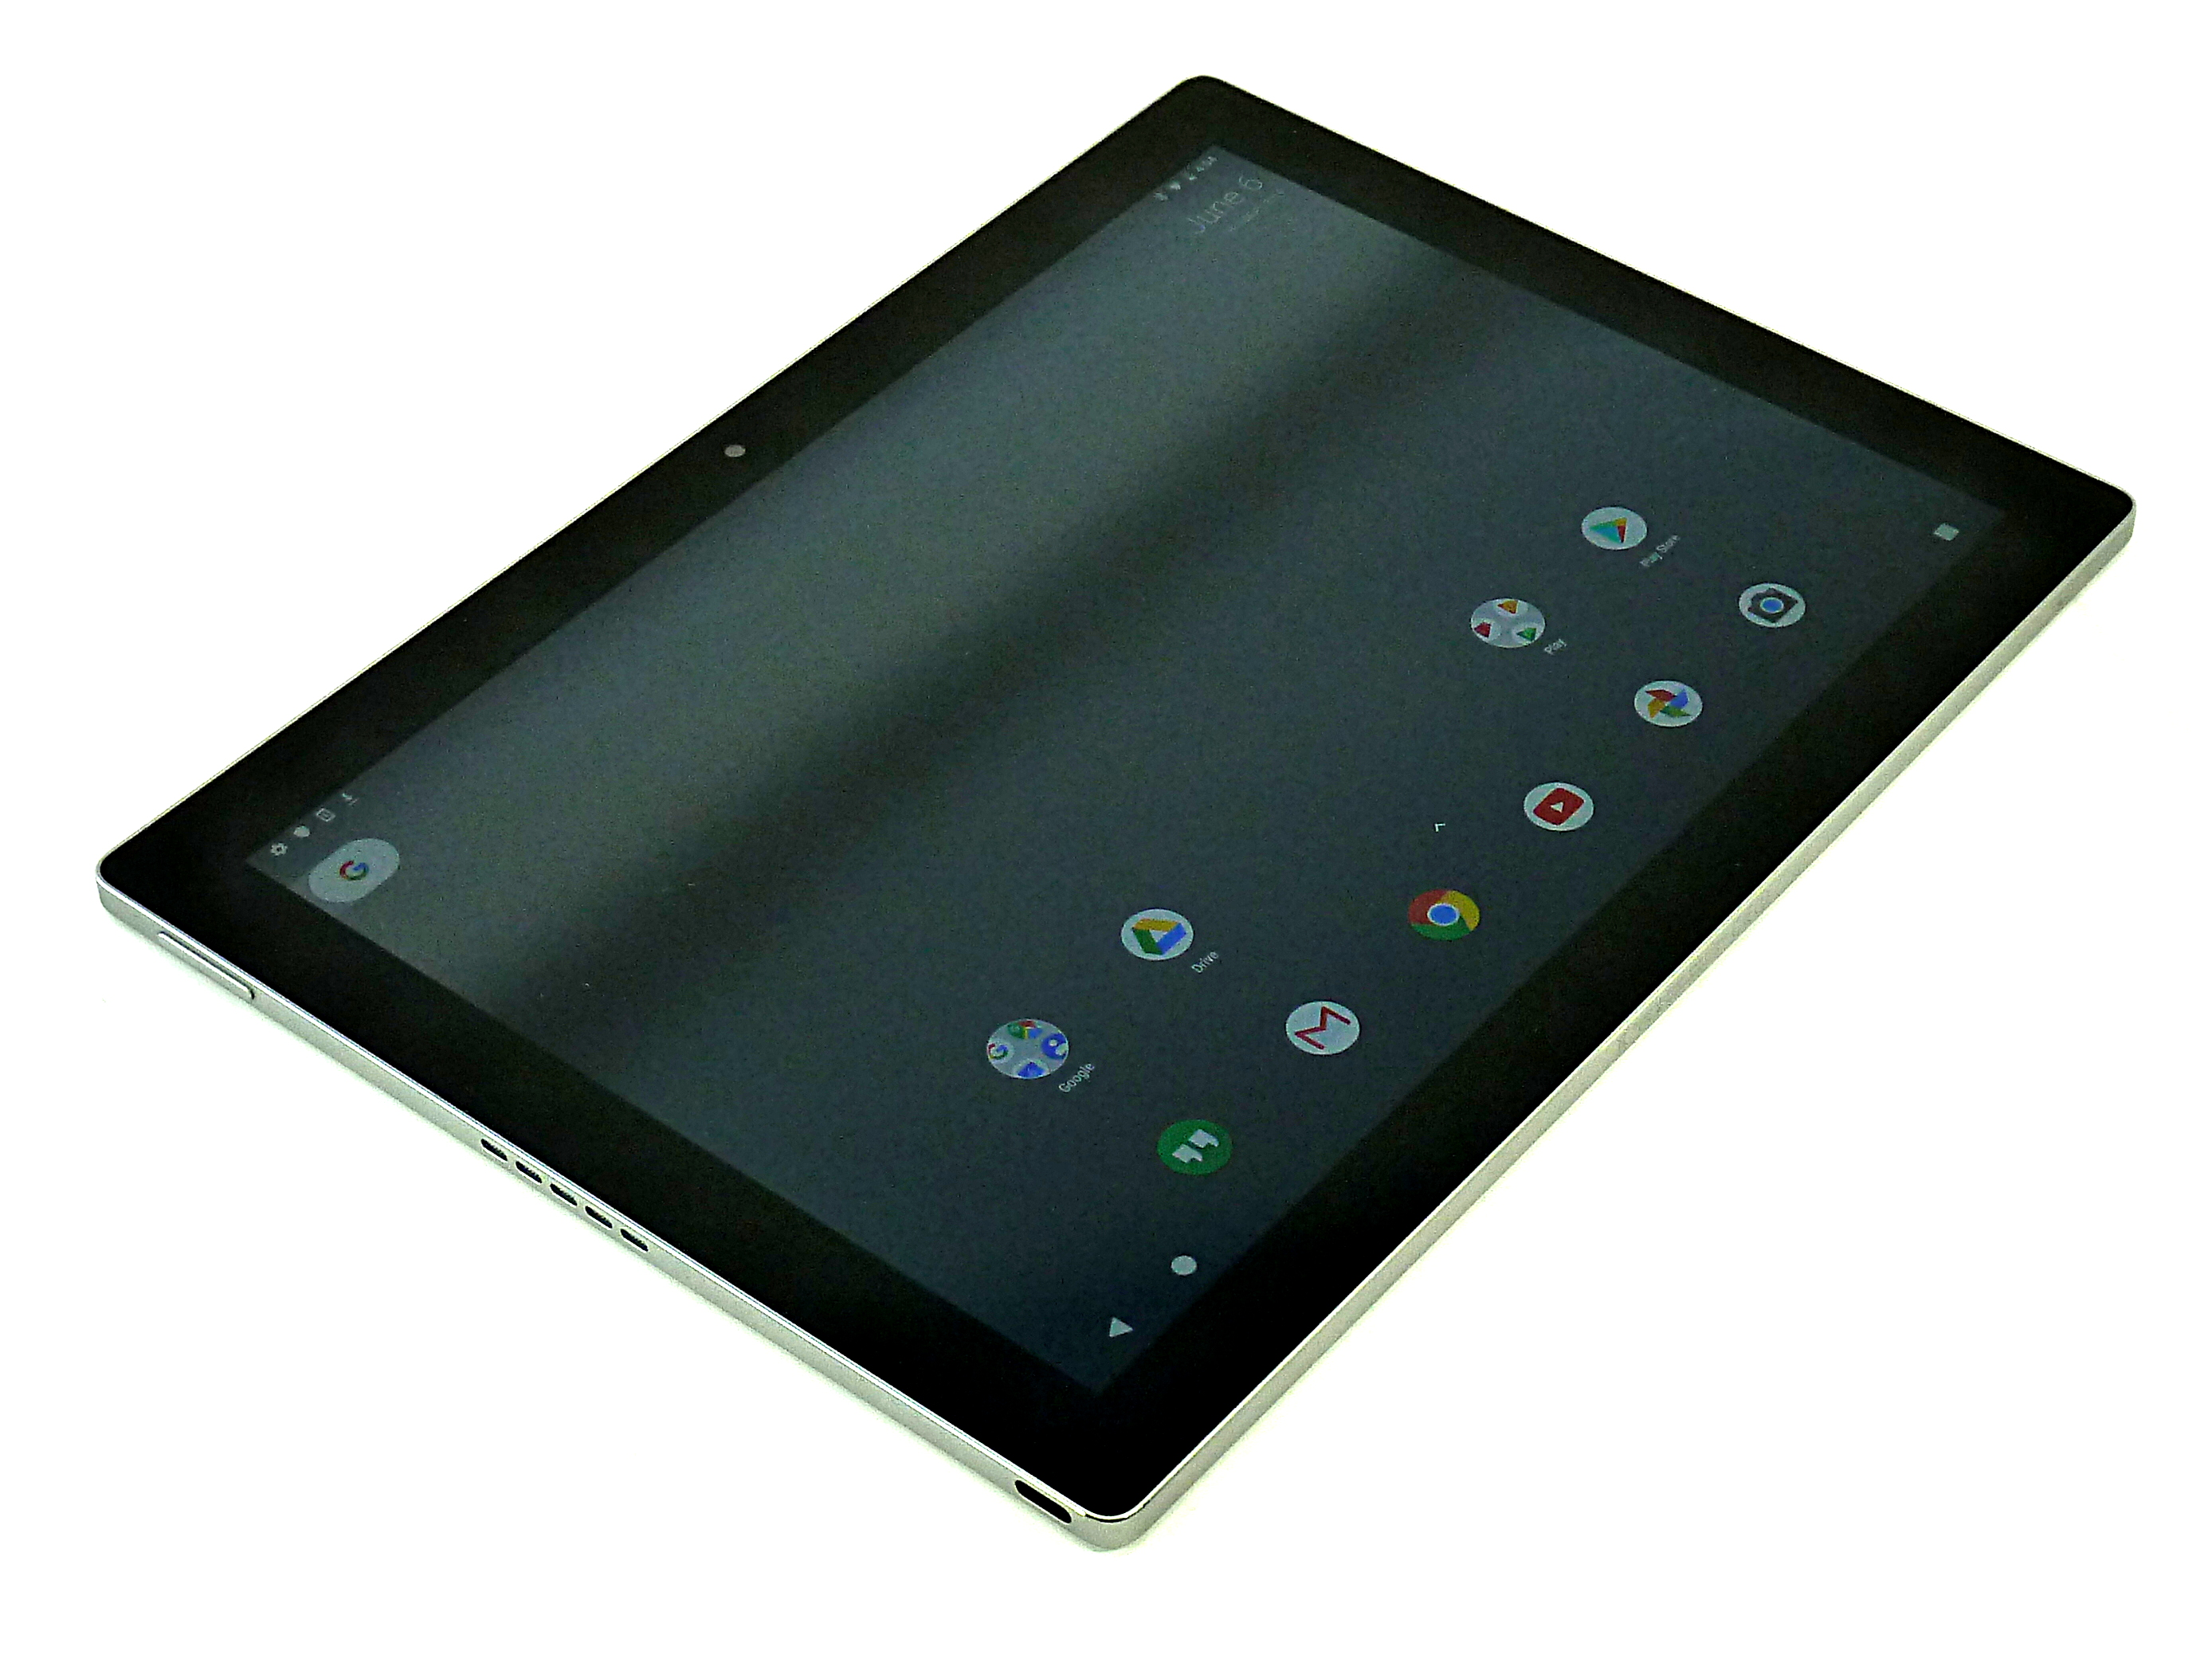 "Google Pixel C 64GB 10.2"" Tablet - WiFi - Black - C1502W"